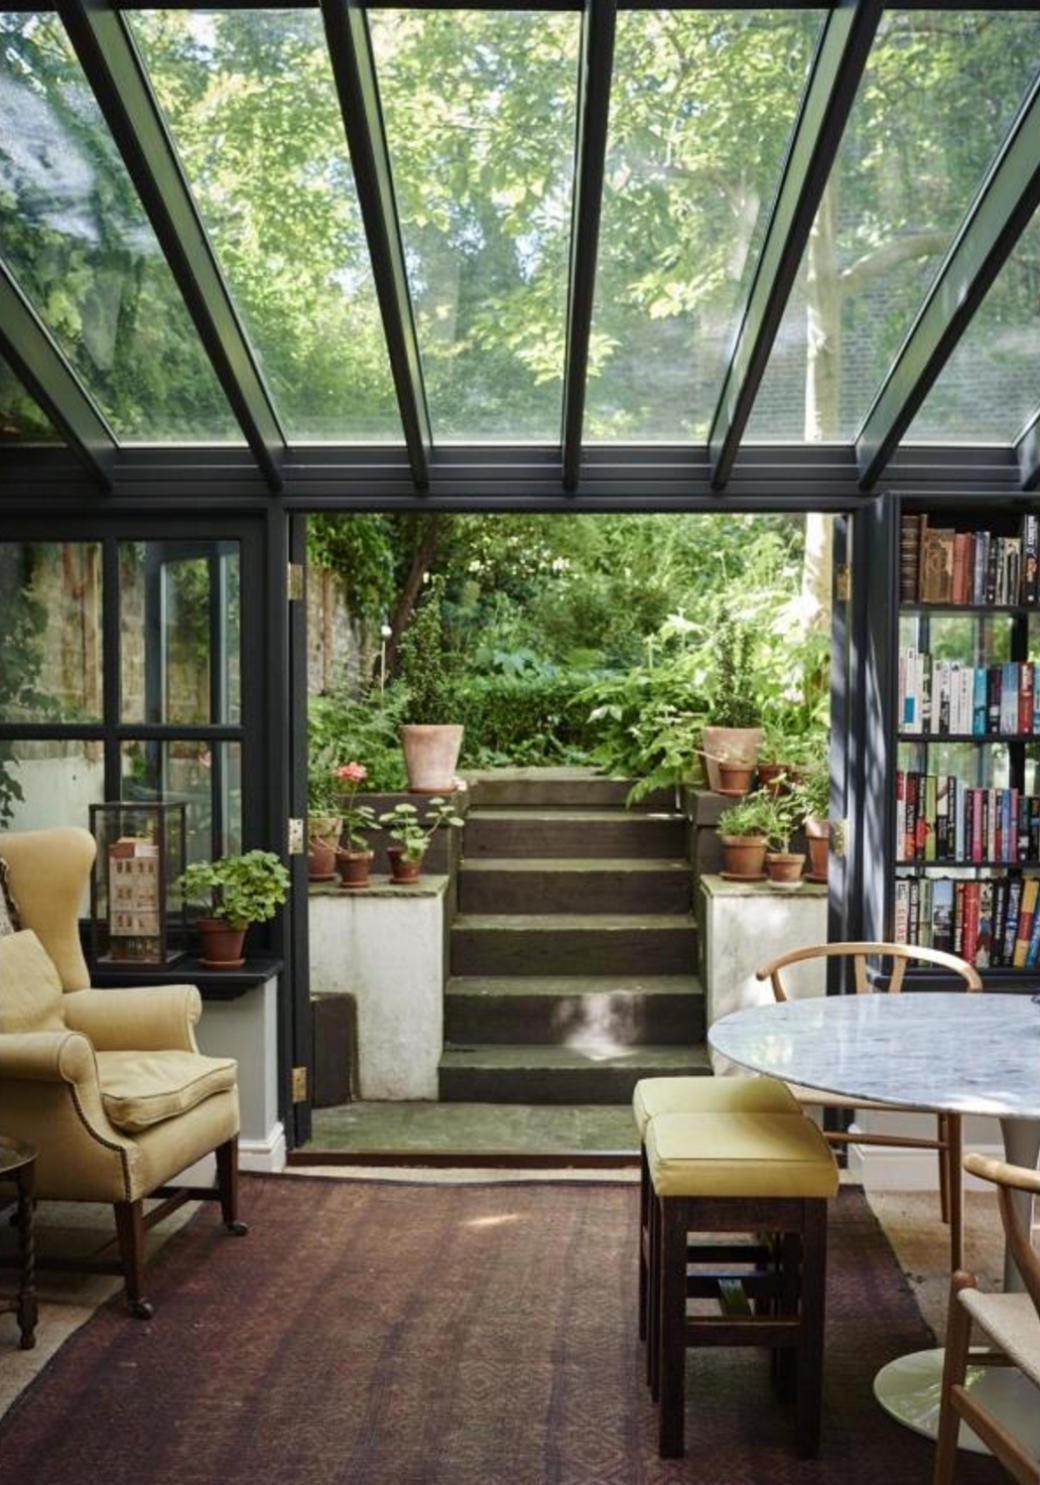 Garden apartment Natural home decor, House styles, House